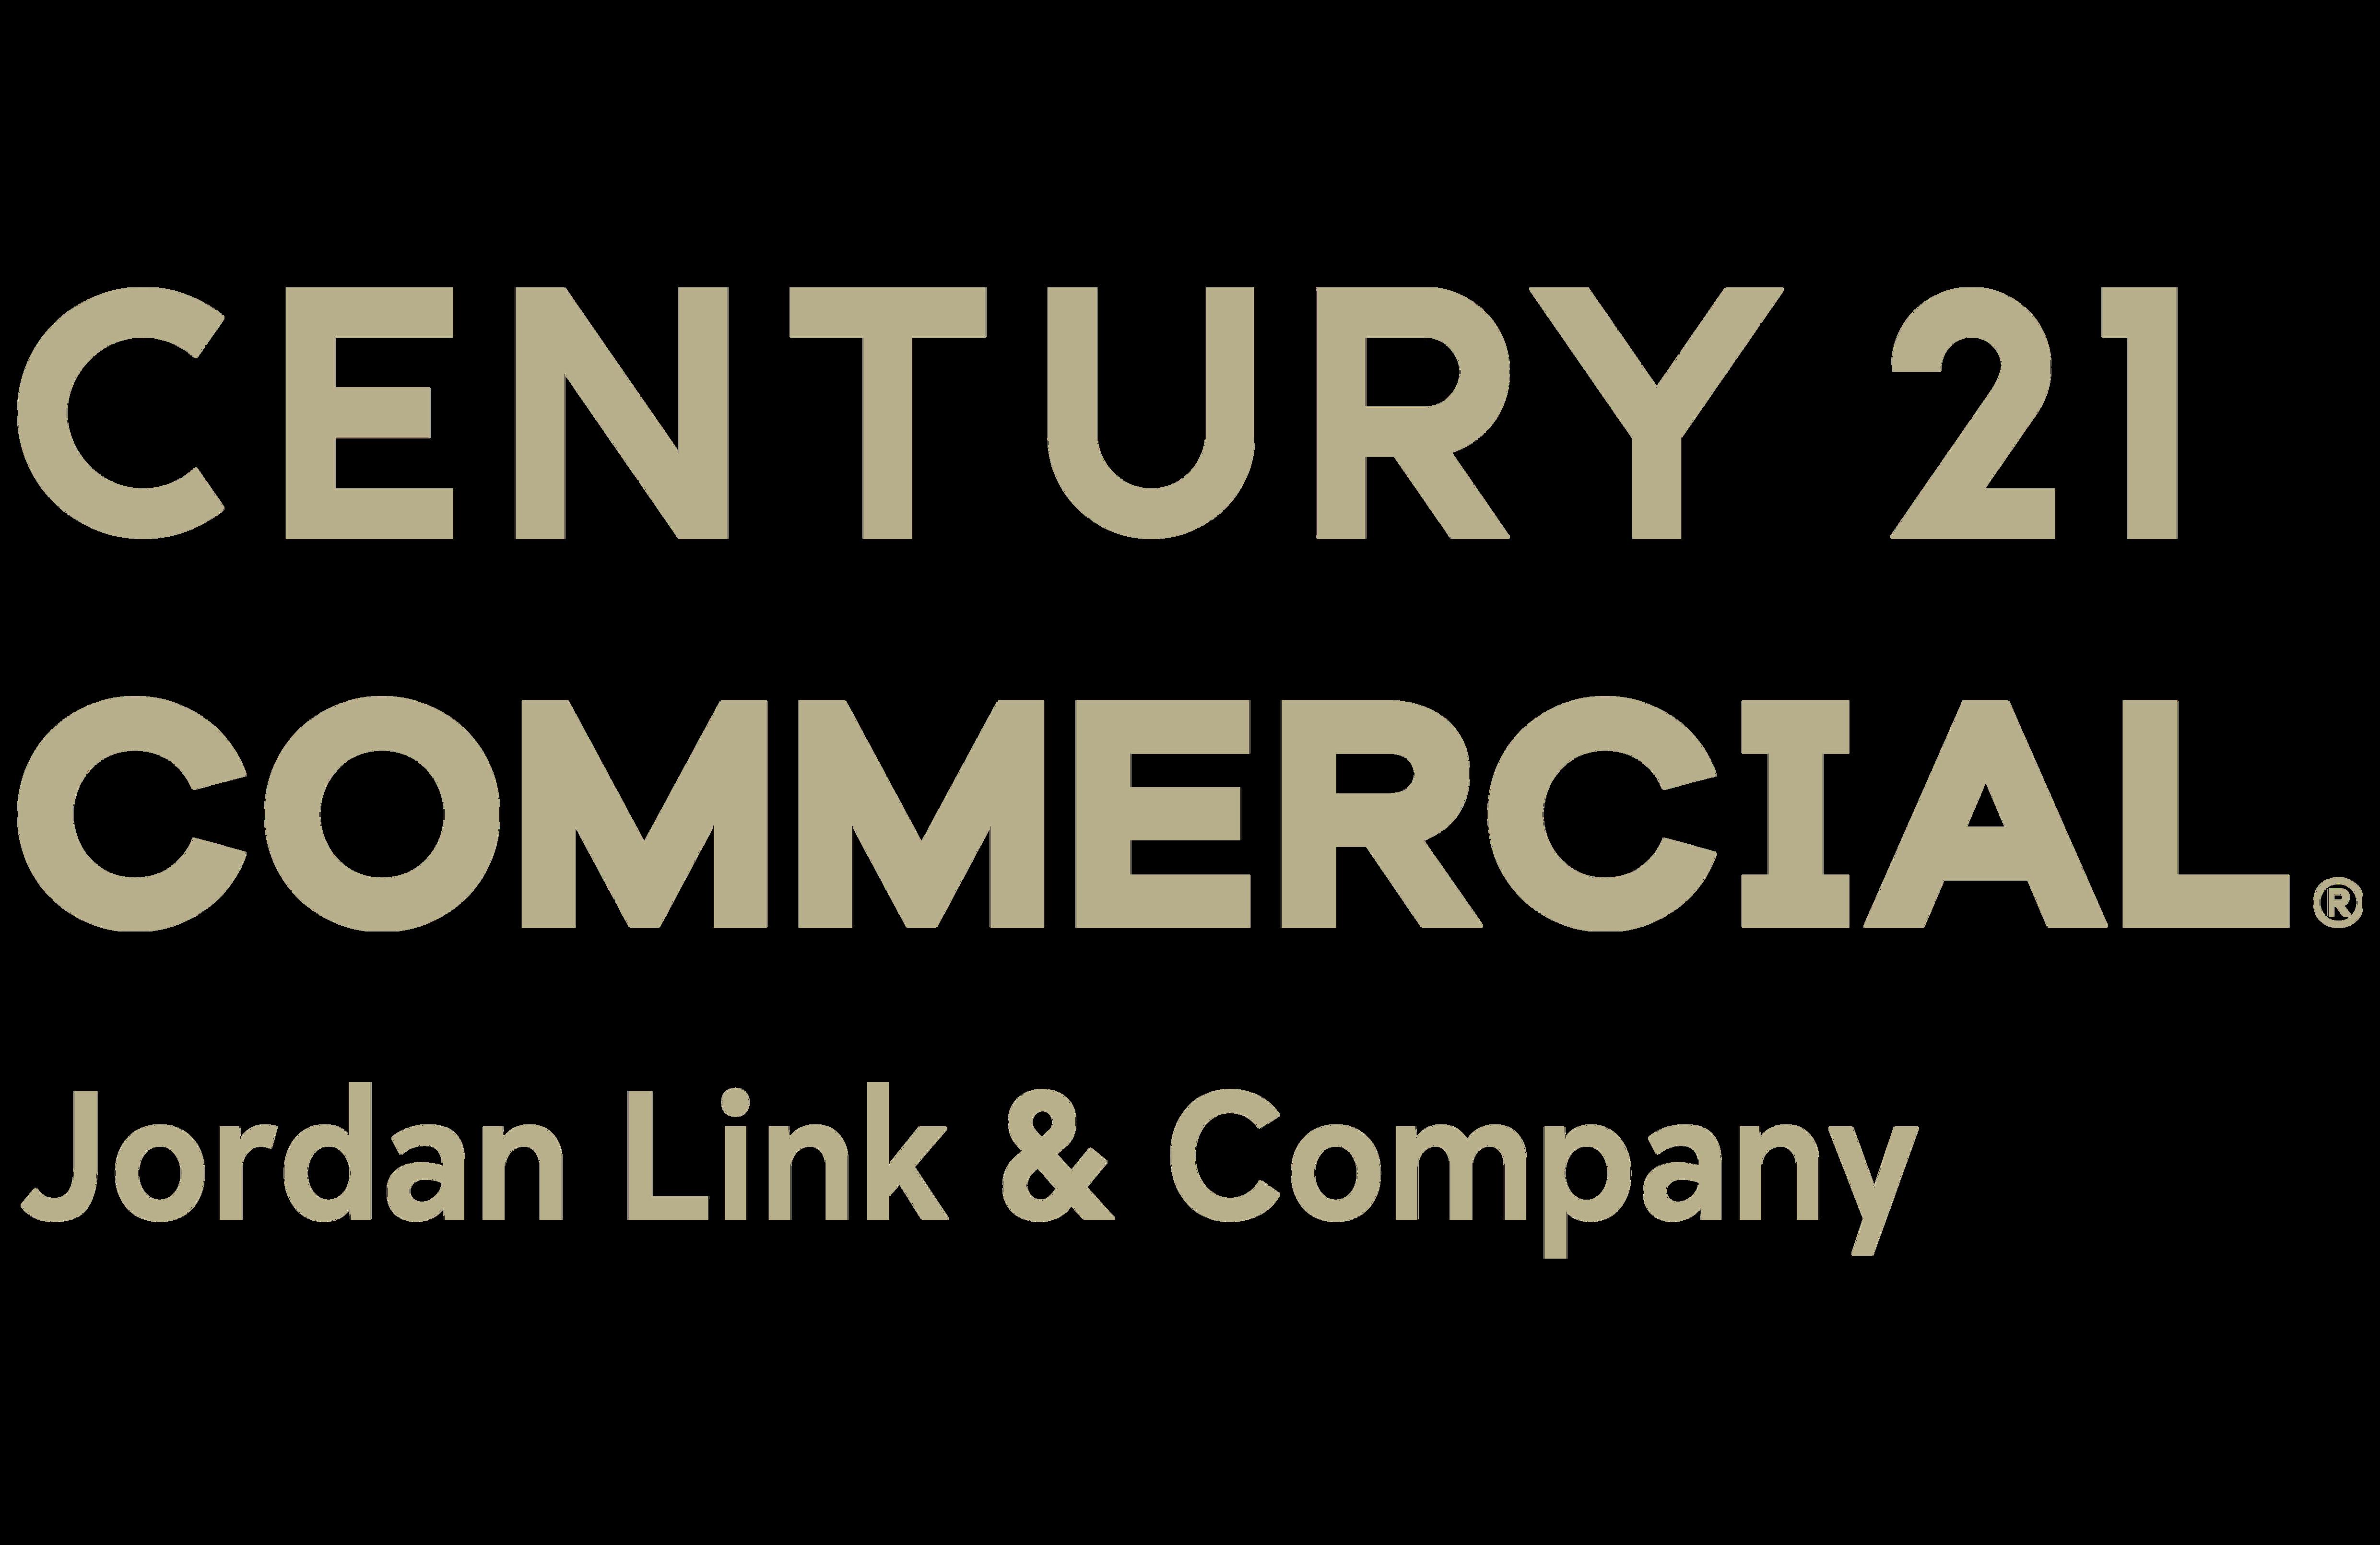 Hummel and Associates of CENTURY 21 Jordan Link & Company logo